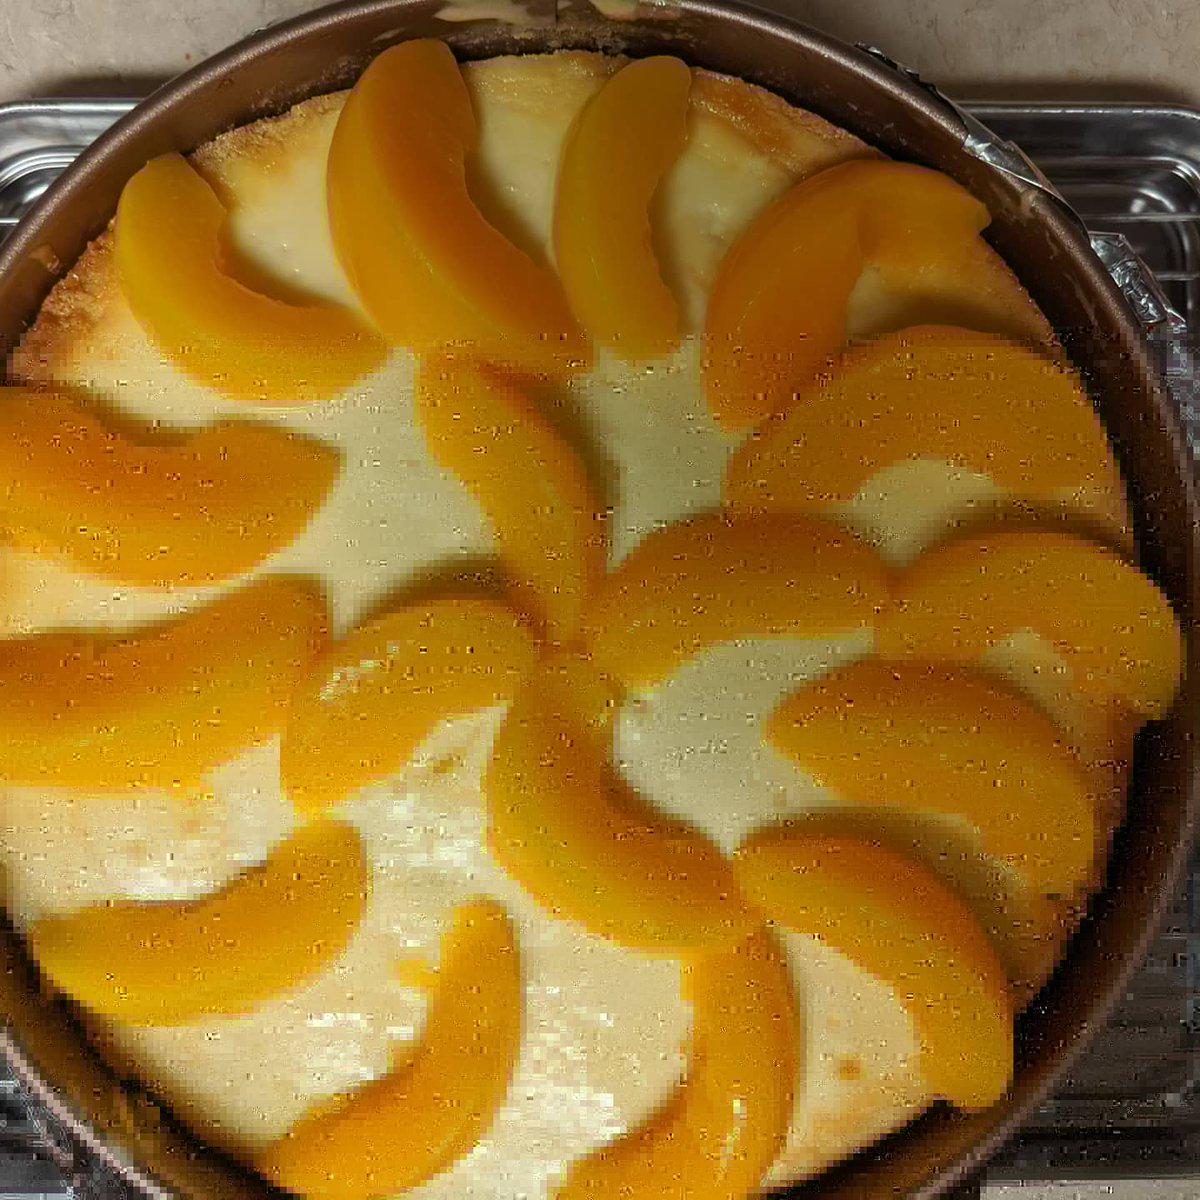 Peach cobbler cheese cake finally made #foodpics https://t.co/CmTV4rN9nB